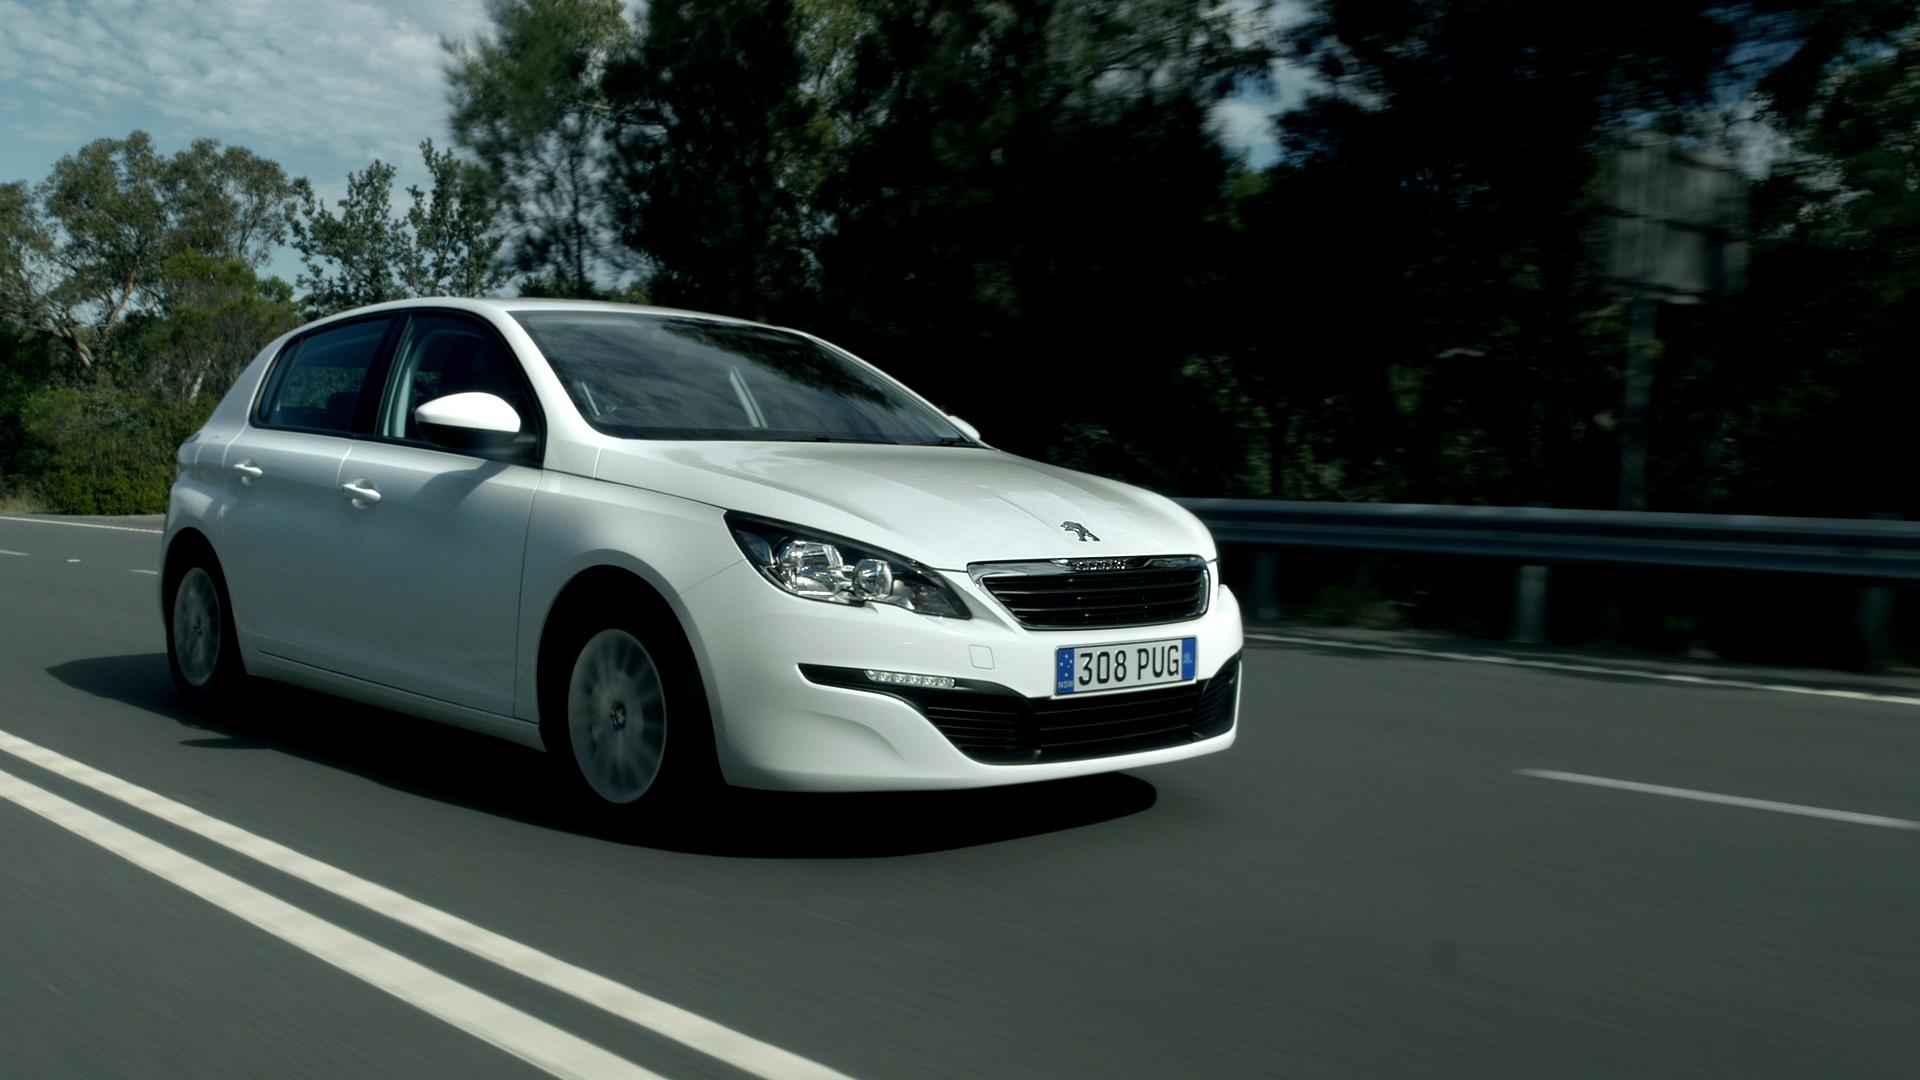 Peugeot308_no_Price.jpg